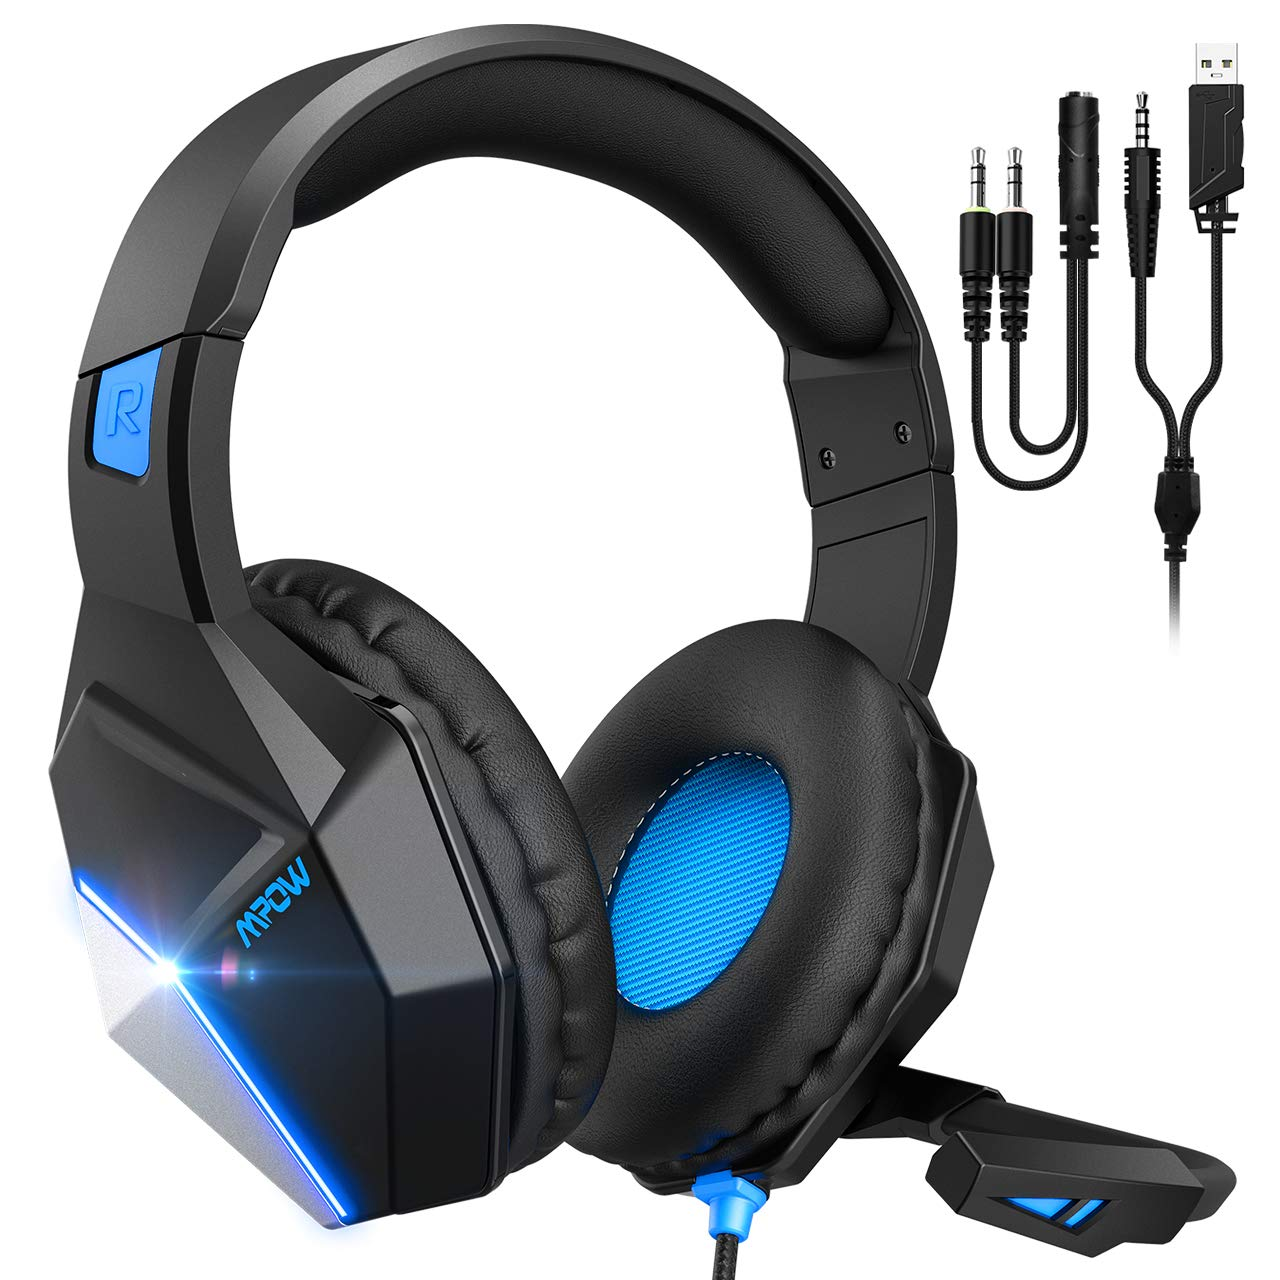 Mpow EG10 Auriculares Gaming(Nueva Versión)para PS4, PC, Xbox One, Cascos con Micrófono Cancelación de Ruido, Auriculares para Nintendo Switch Mac 3.5mm USB Jack Sonidos Envolventes: Amazon.es: Electrónica